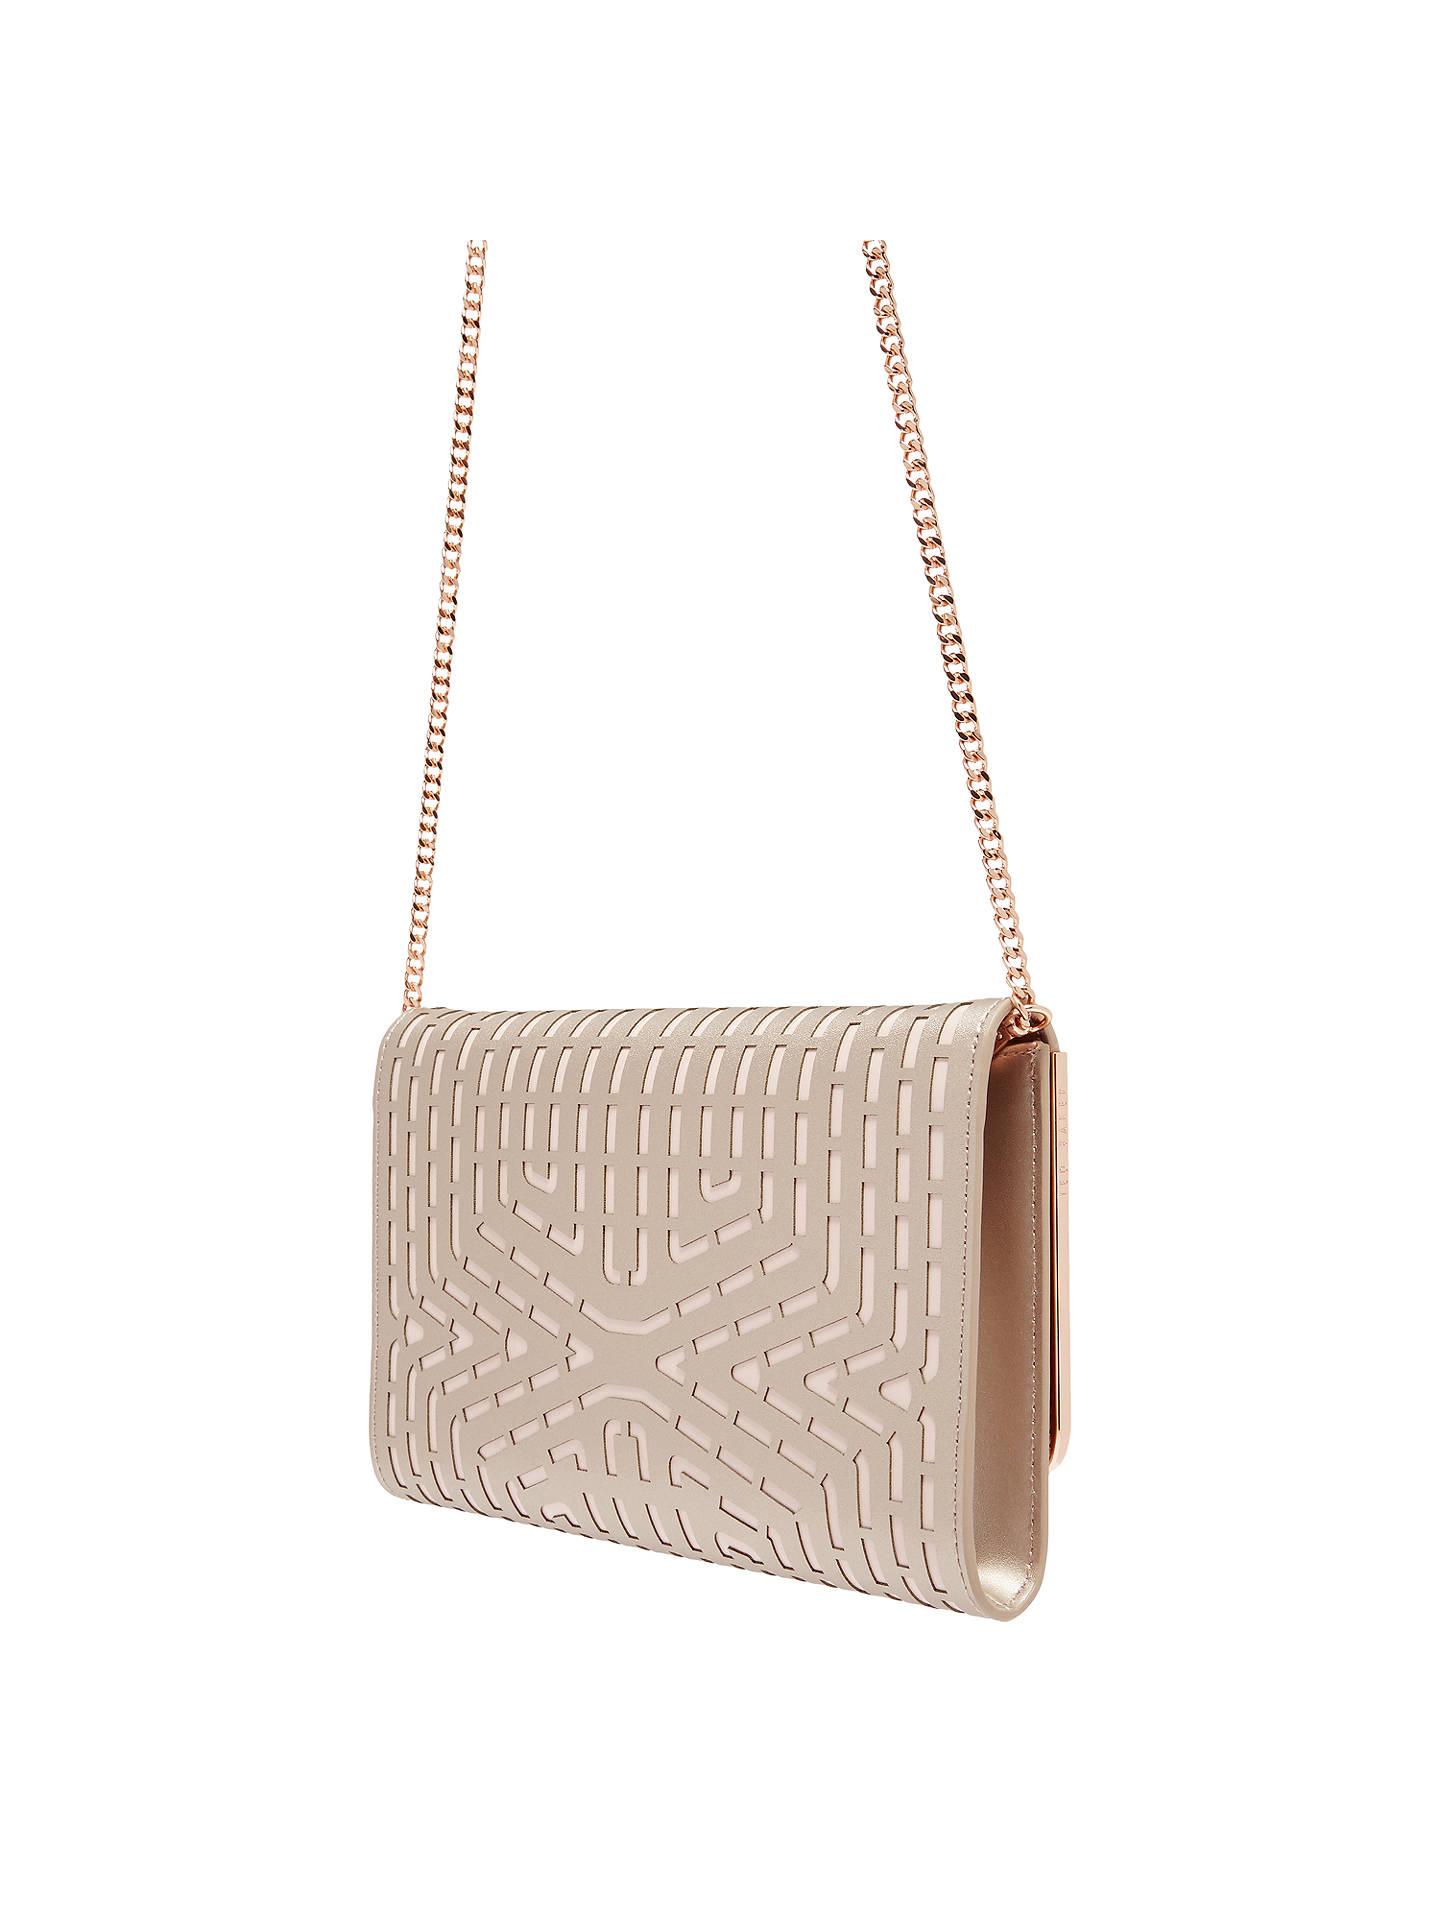 4438ee7b614 ... Buy Ted Baker Bree Bow Leather Clutch Bag, Rose Gold Online at  johnlewis.com ...